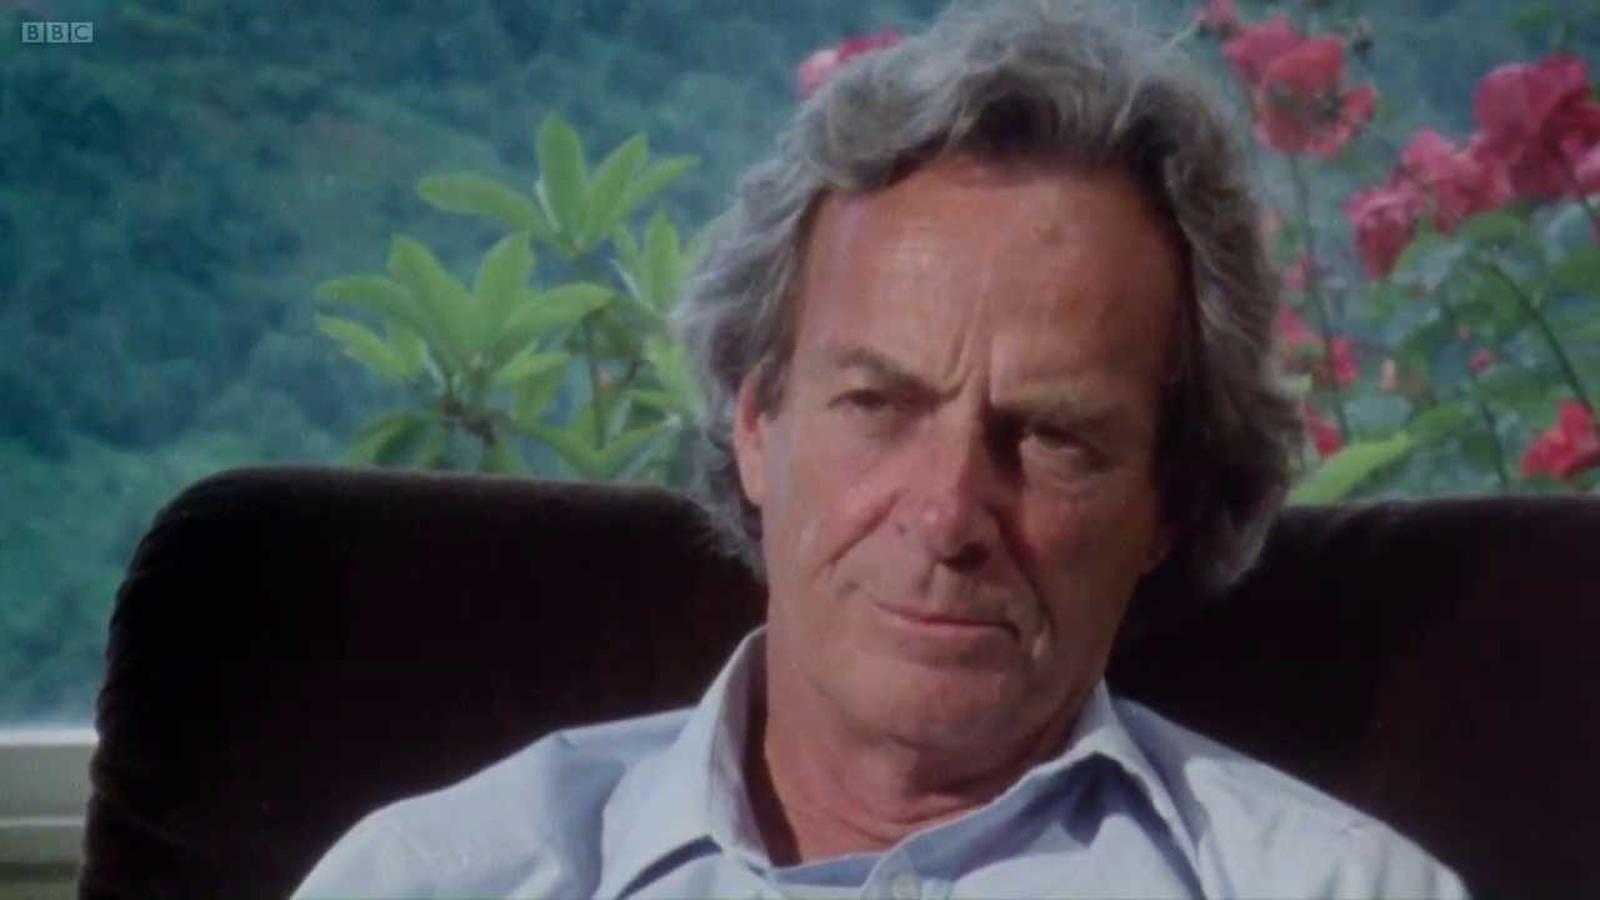 El fantàstic senyor Feynman